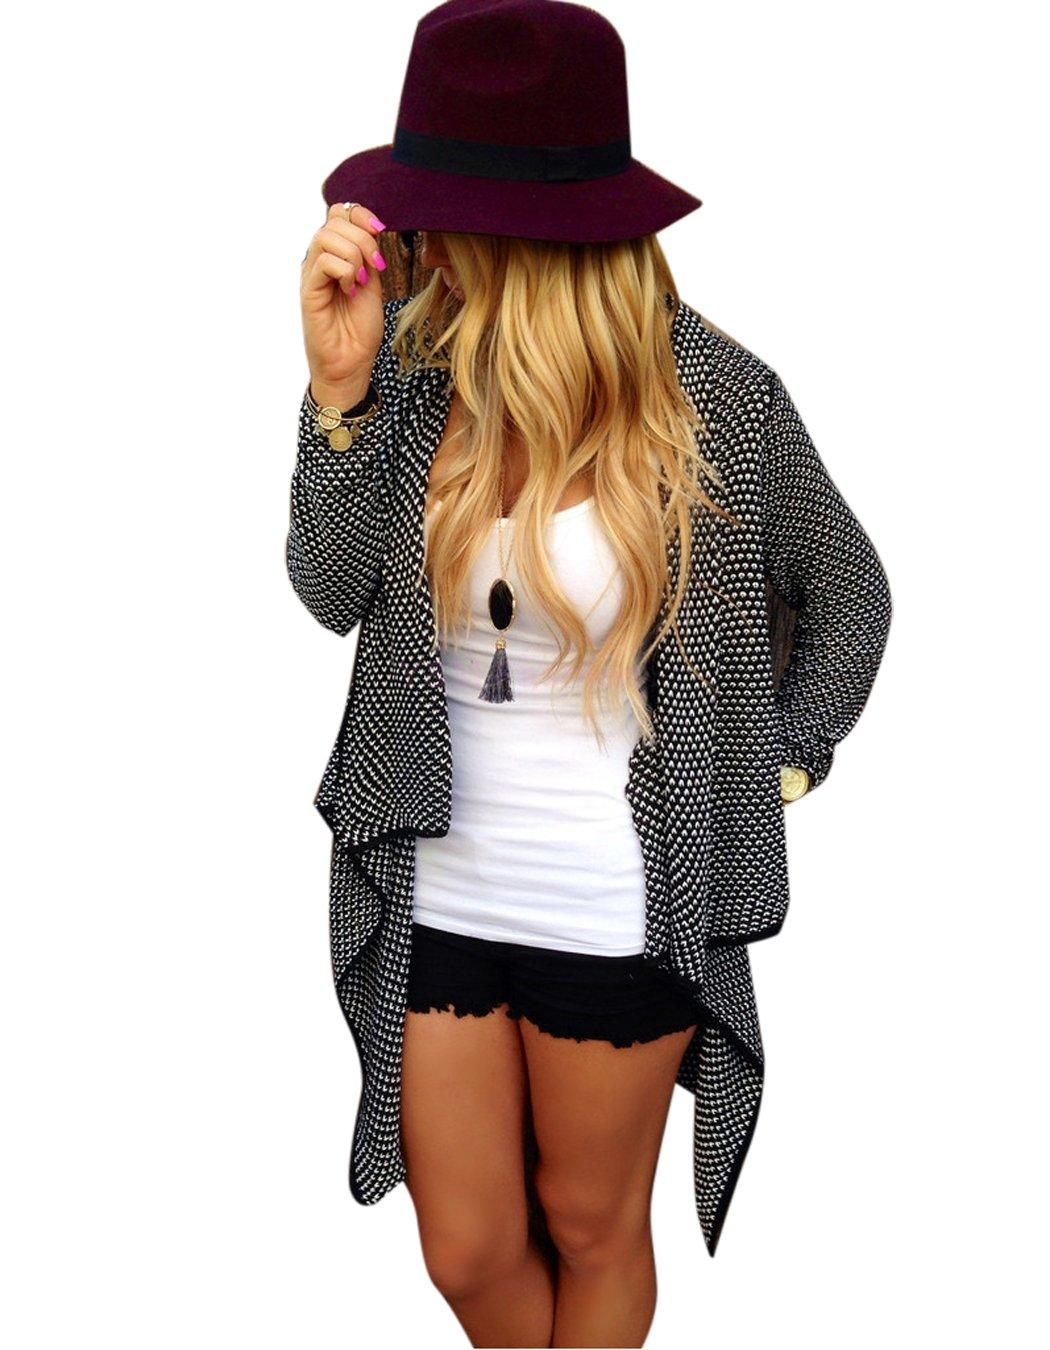 2015 New Autunm Winter Ladies Women Loose Casual Knitted Cardigan Jacket Irregular Women Sweater Tops Coat Plus Size Outwear(China (Mainland))